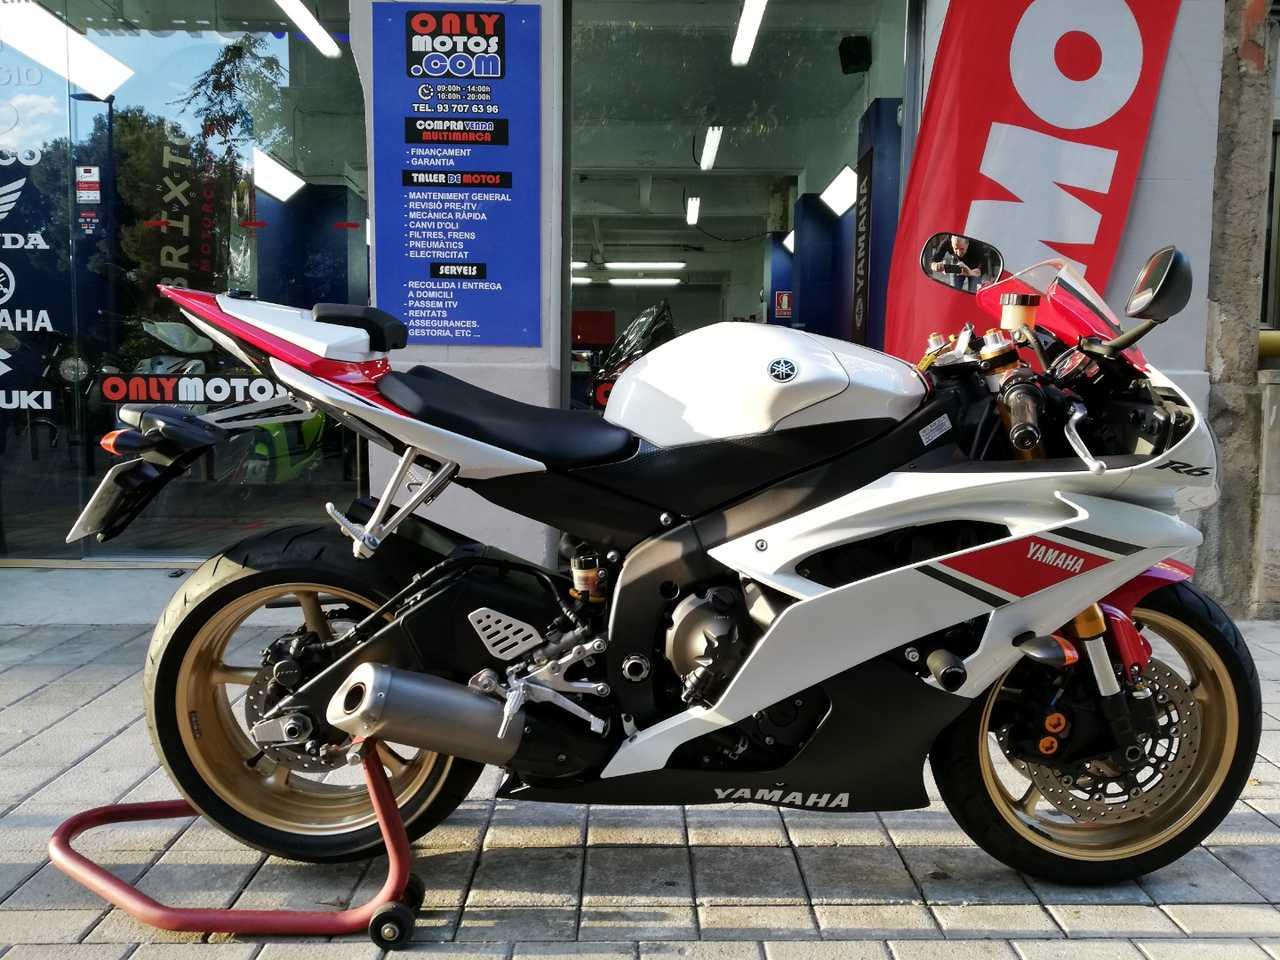 Yamaha YZF - R 6 R  - Foto 1